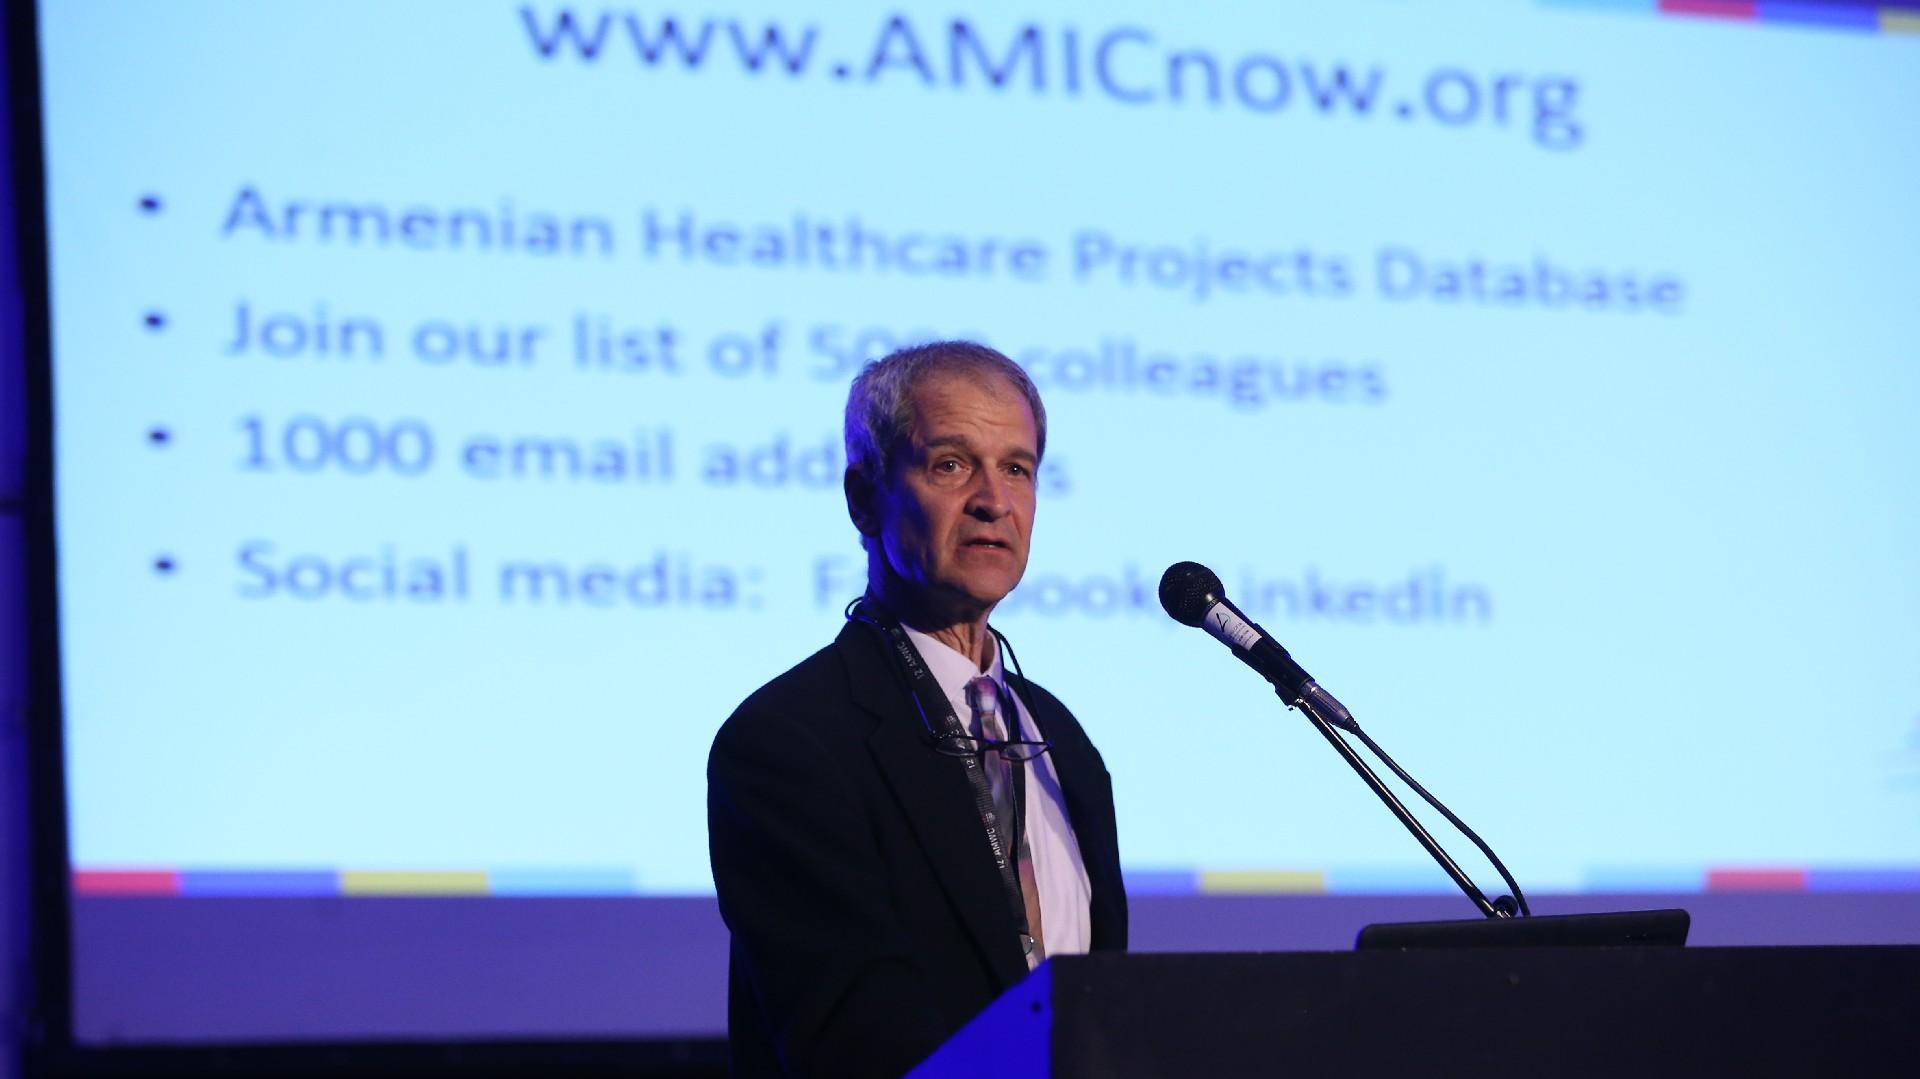 Manoukian Jerry, Presidente de AMIC (Armenian Medical International Committee), una organización sin fines de lucro con sede en Canadá